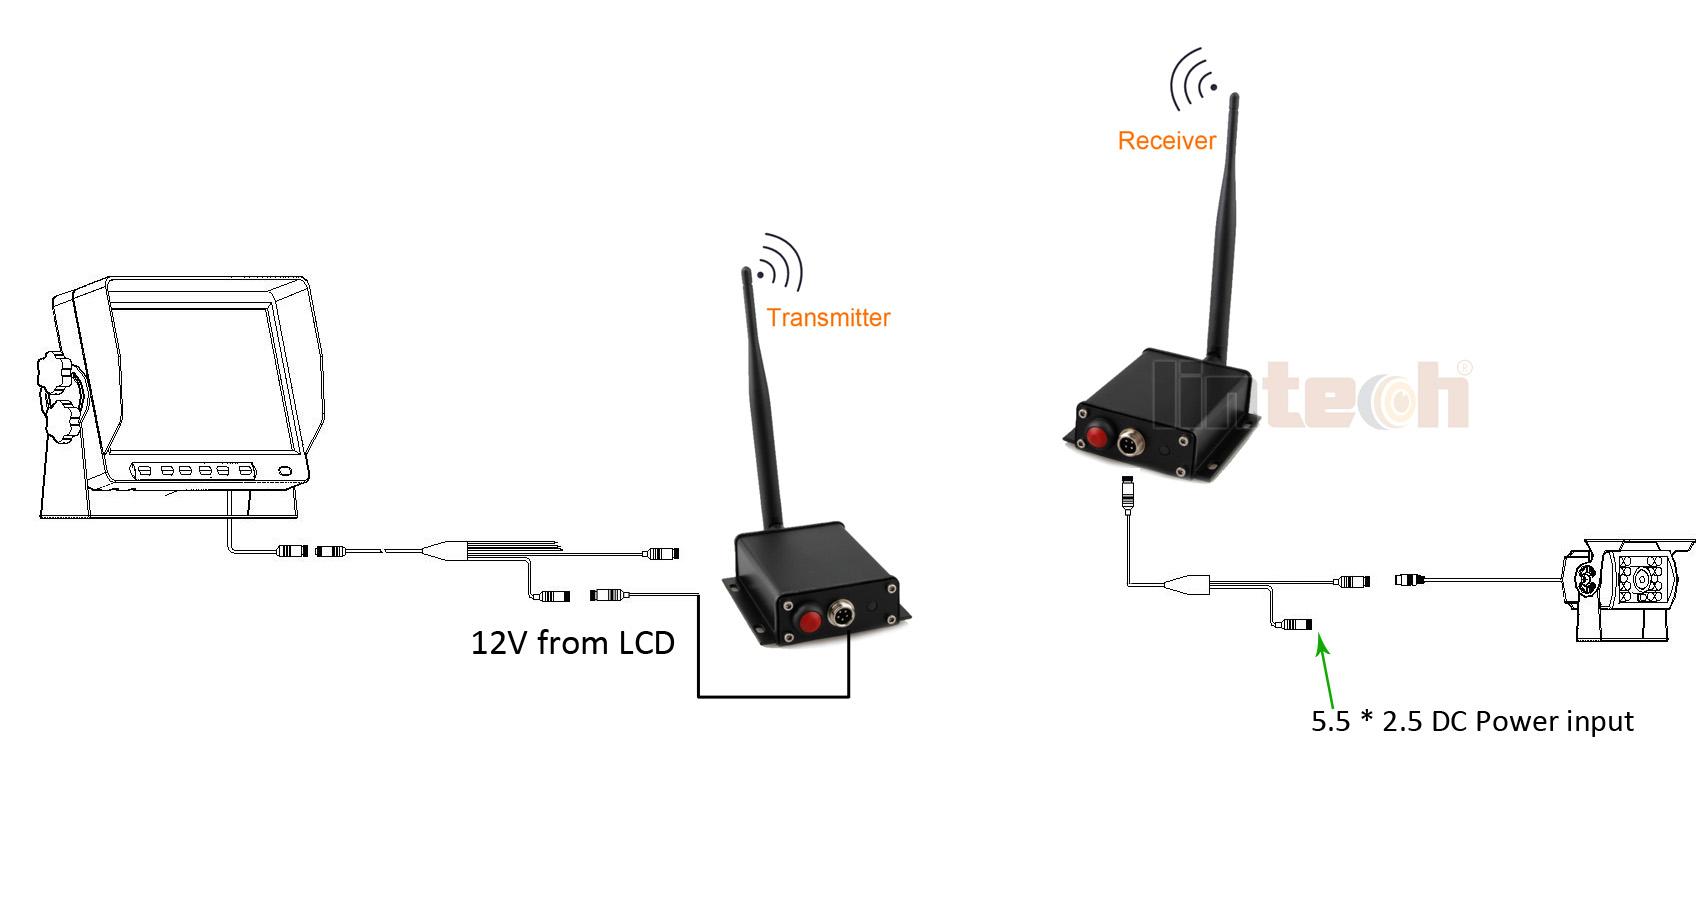 2.4Ghz Digital signal Wireless Transmitter & Receiver kit